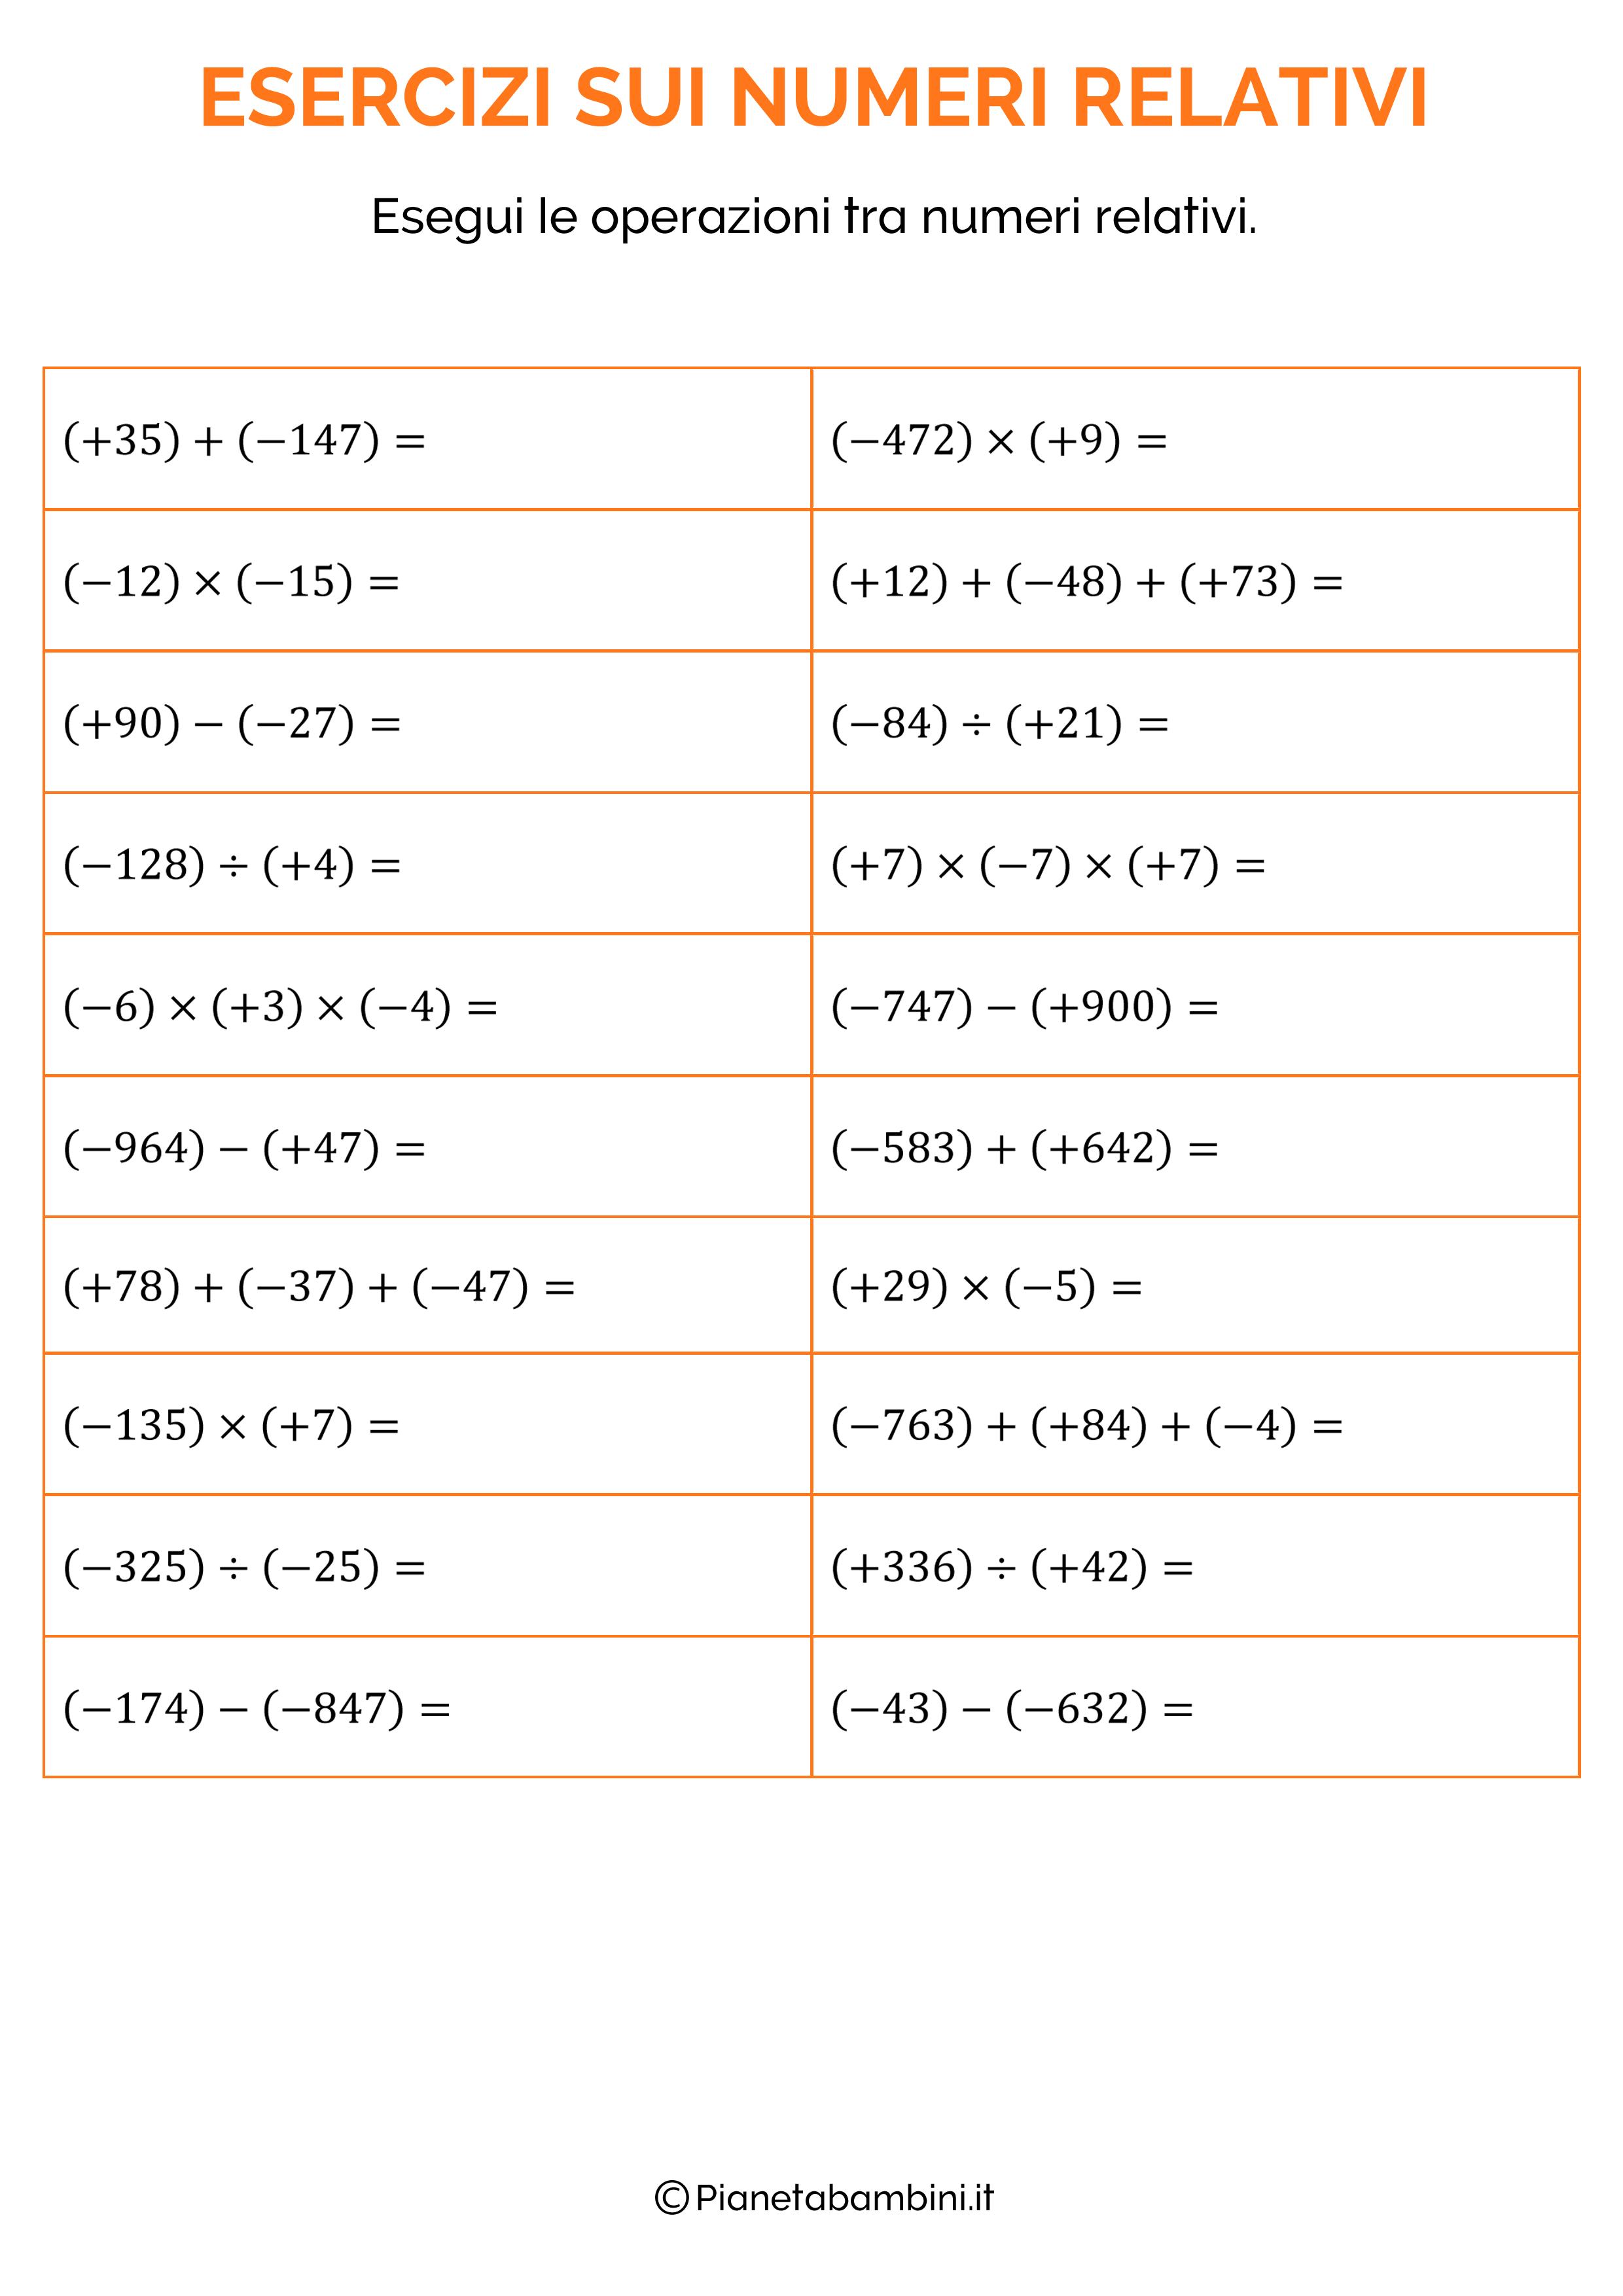 Operazioni miste tra numeri relativi